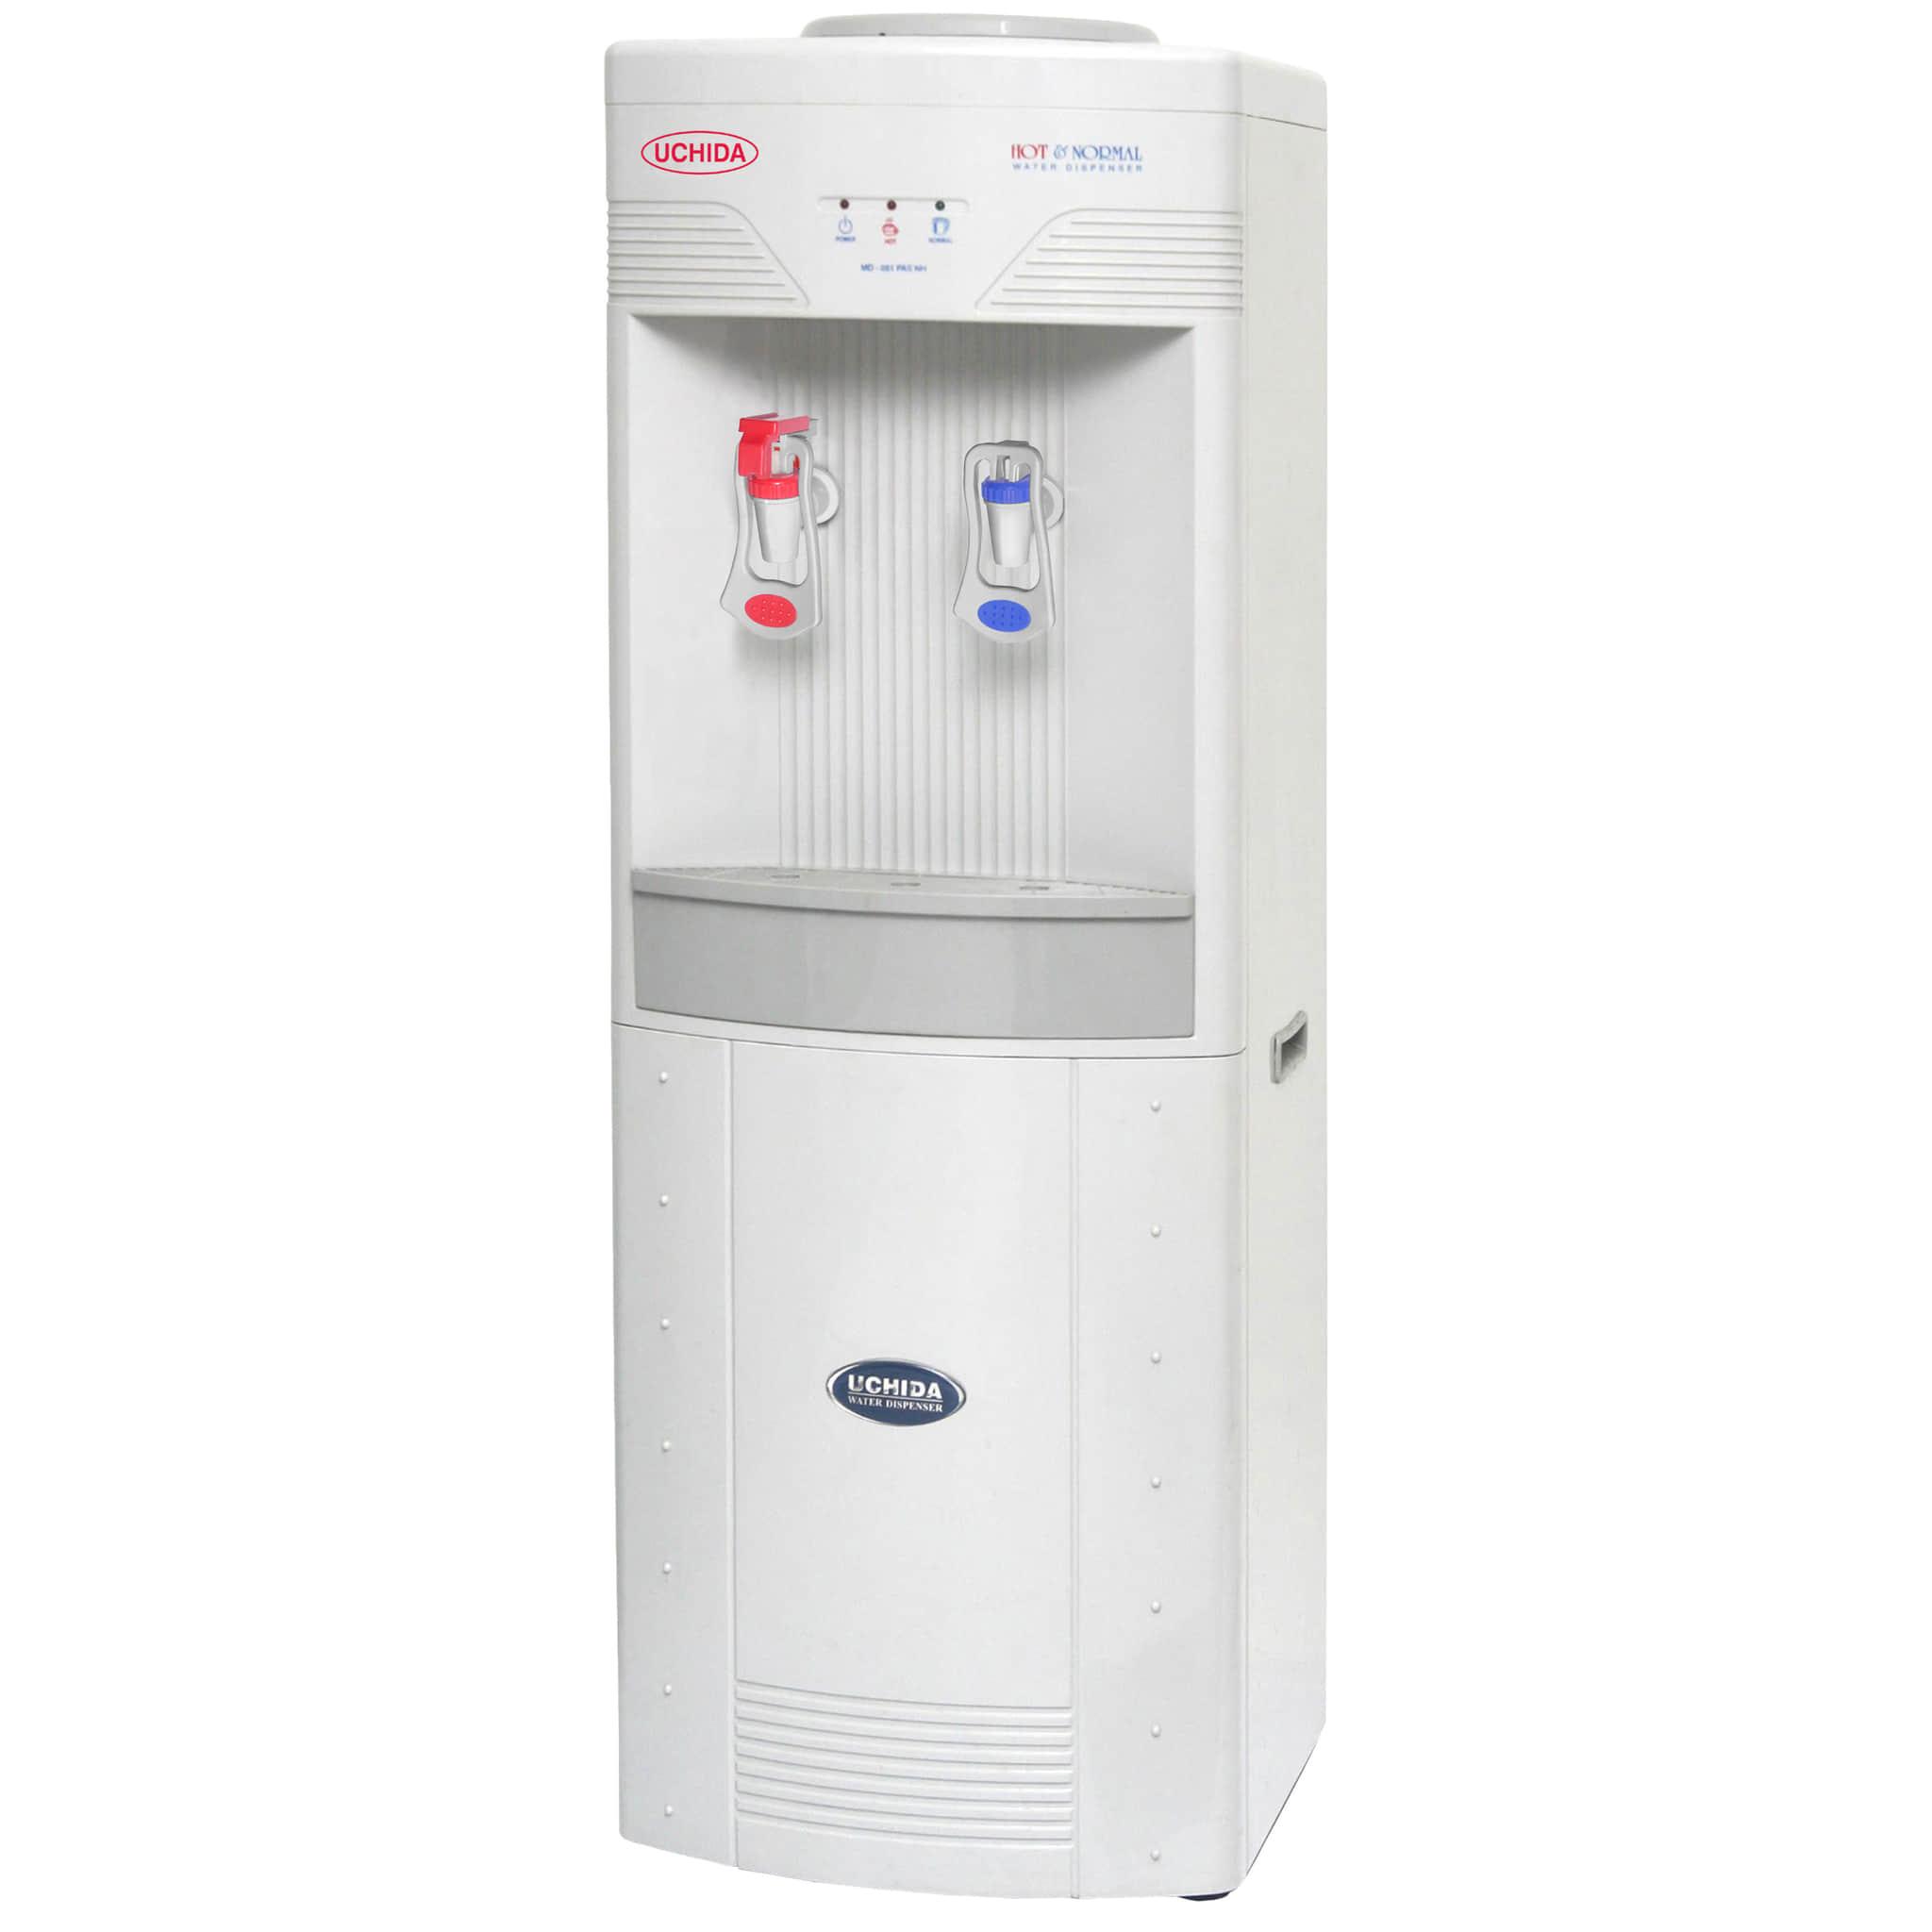 Maspion - Dispenser Tinggi Hot Normal MD051PAS